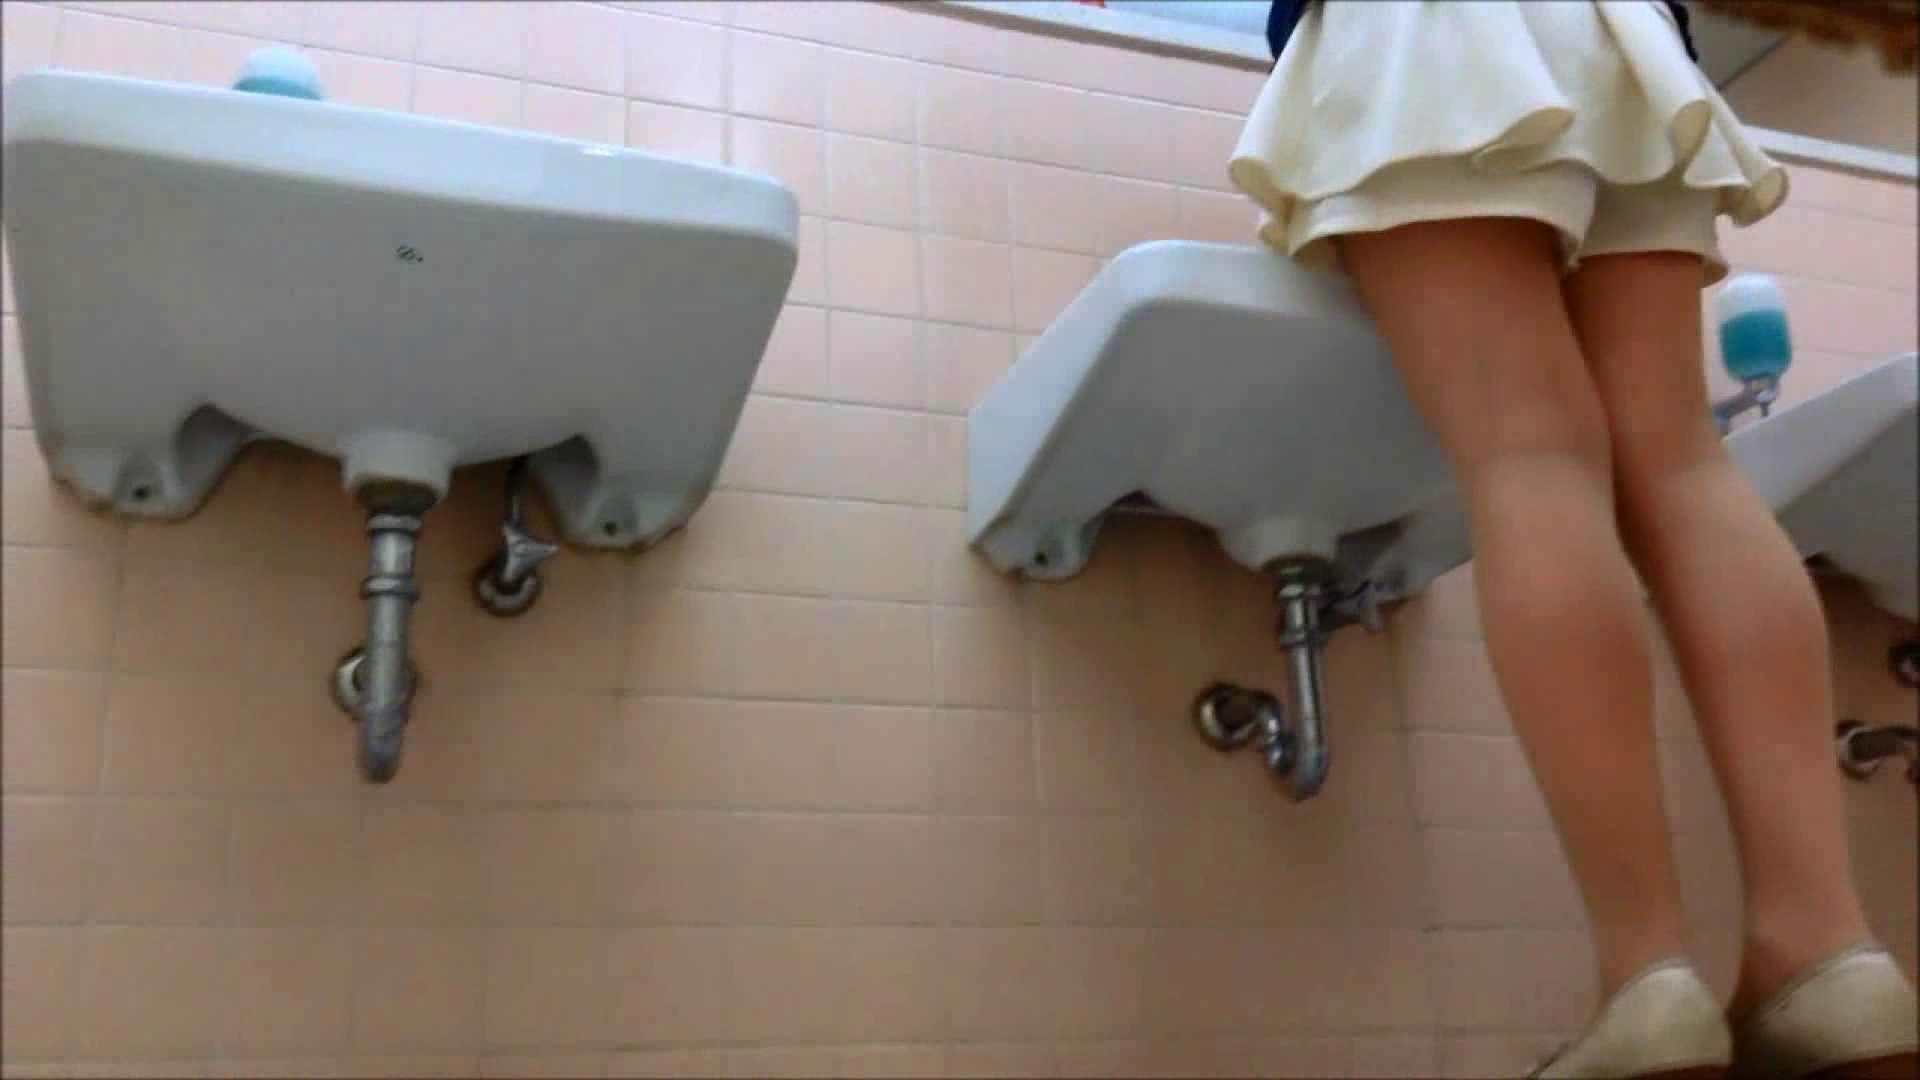 某有名大学女性洗面所 vol.16 OLのエロ生活 オマンコ無修正動画無料 45連発 6